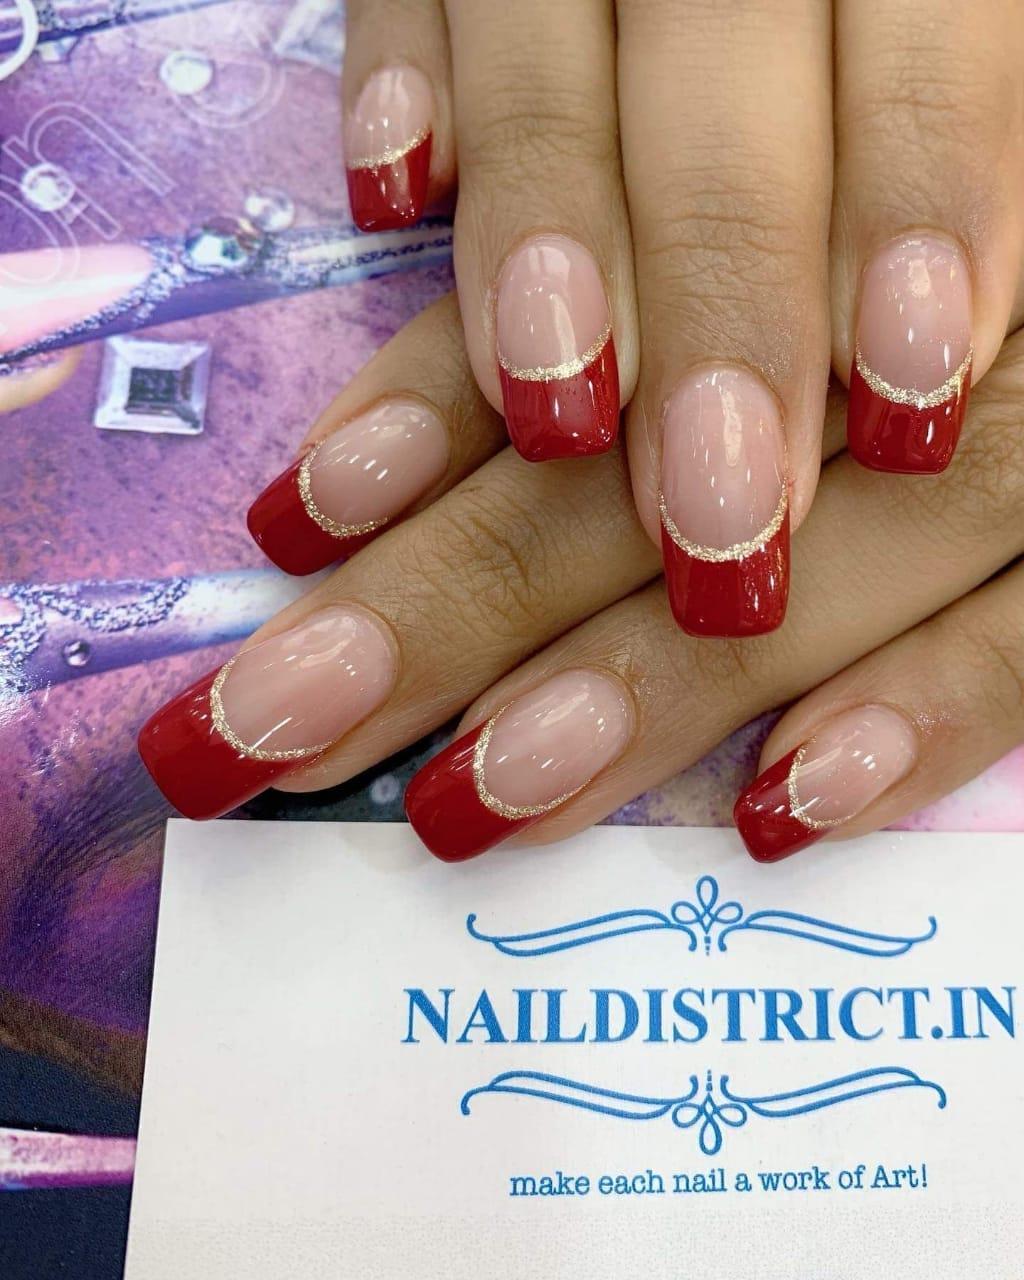 Nails Around Me : nails, around, Beauty, Salon, Naildistrict.in, Vishal, Sharma, Medium